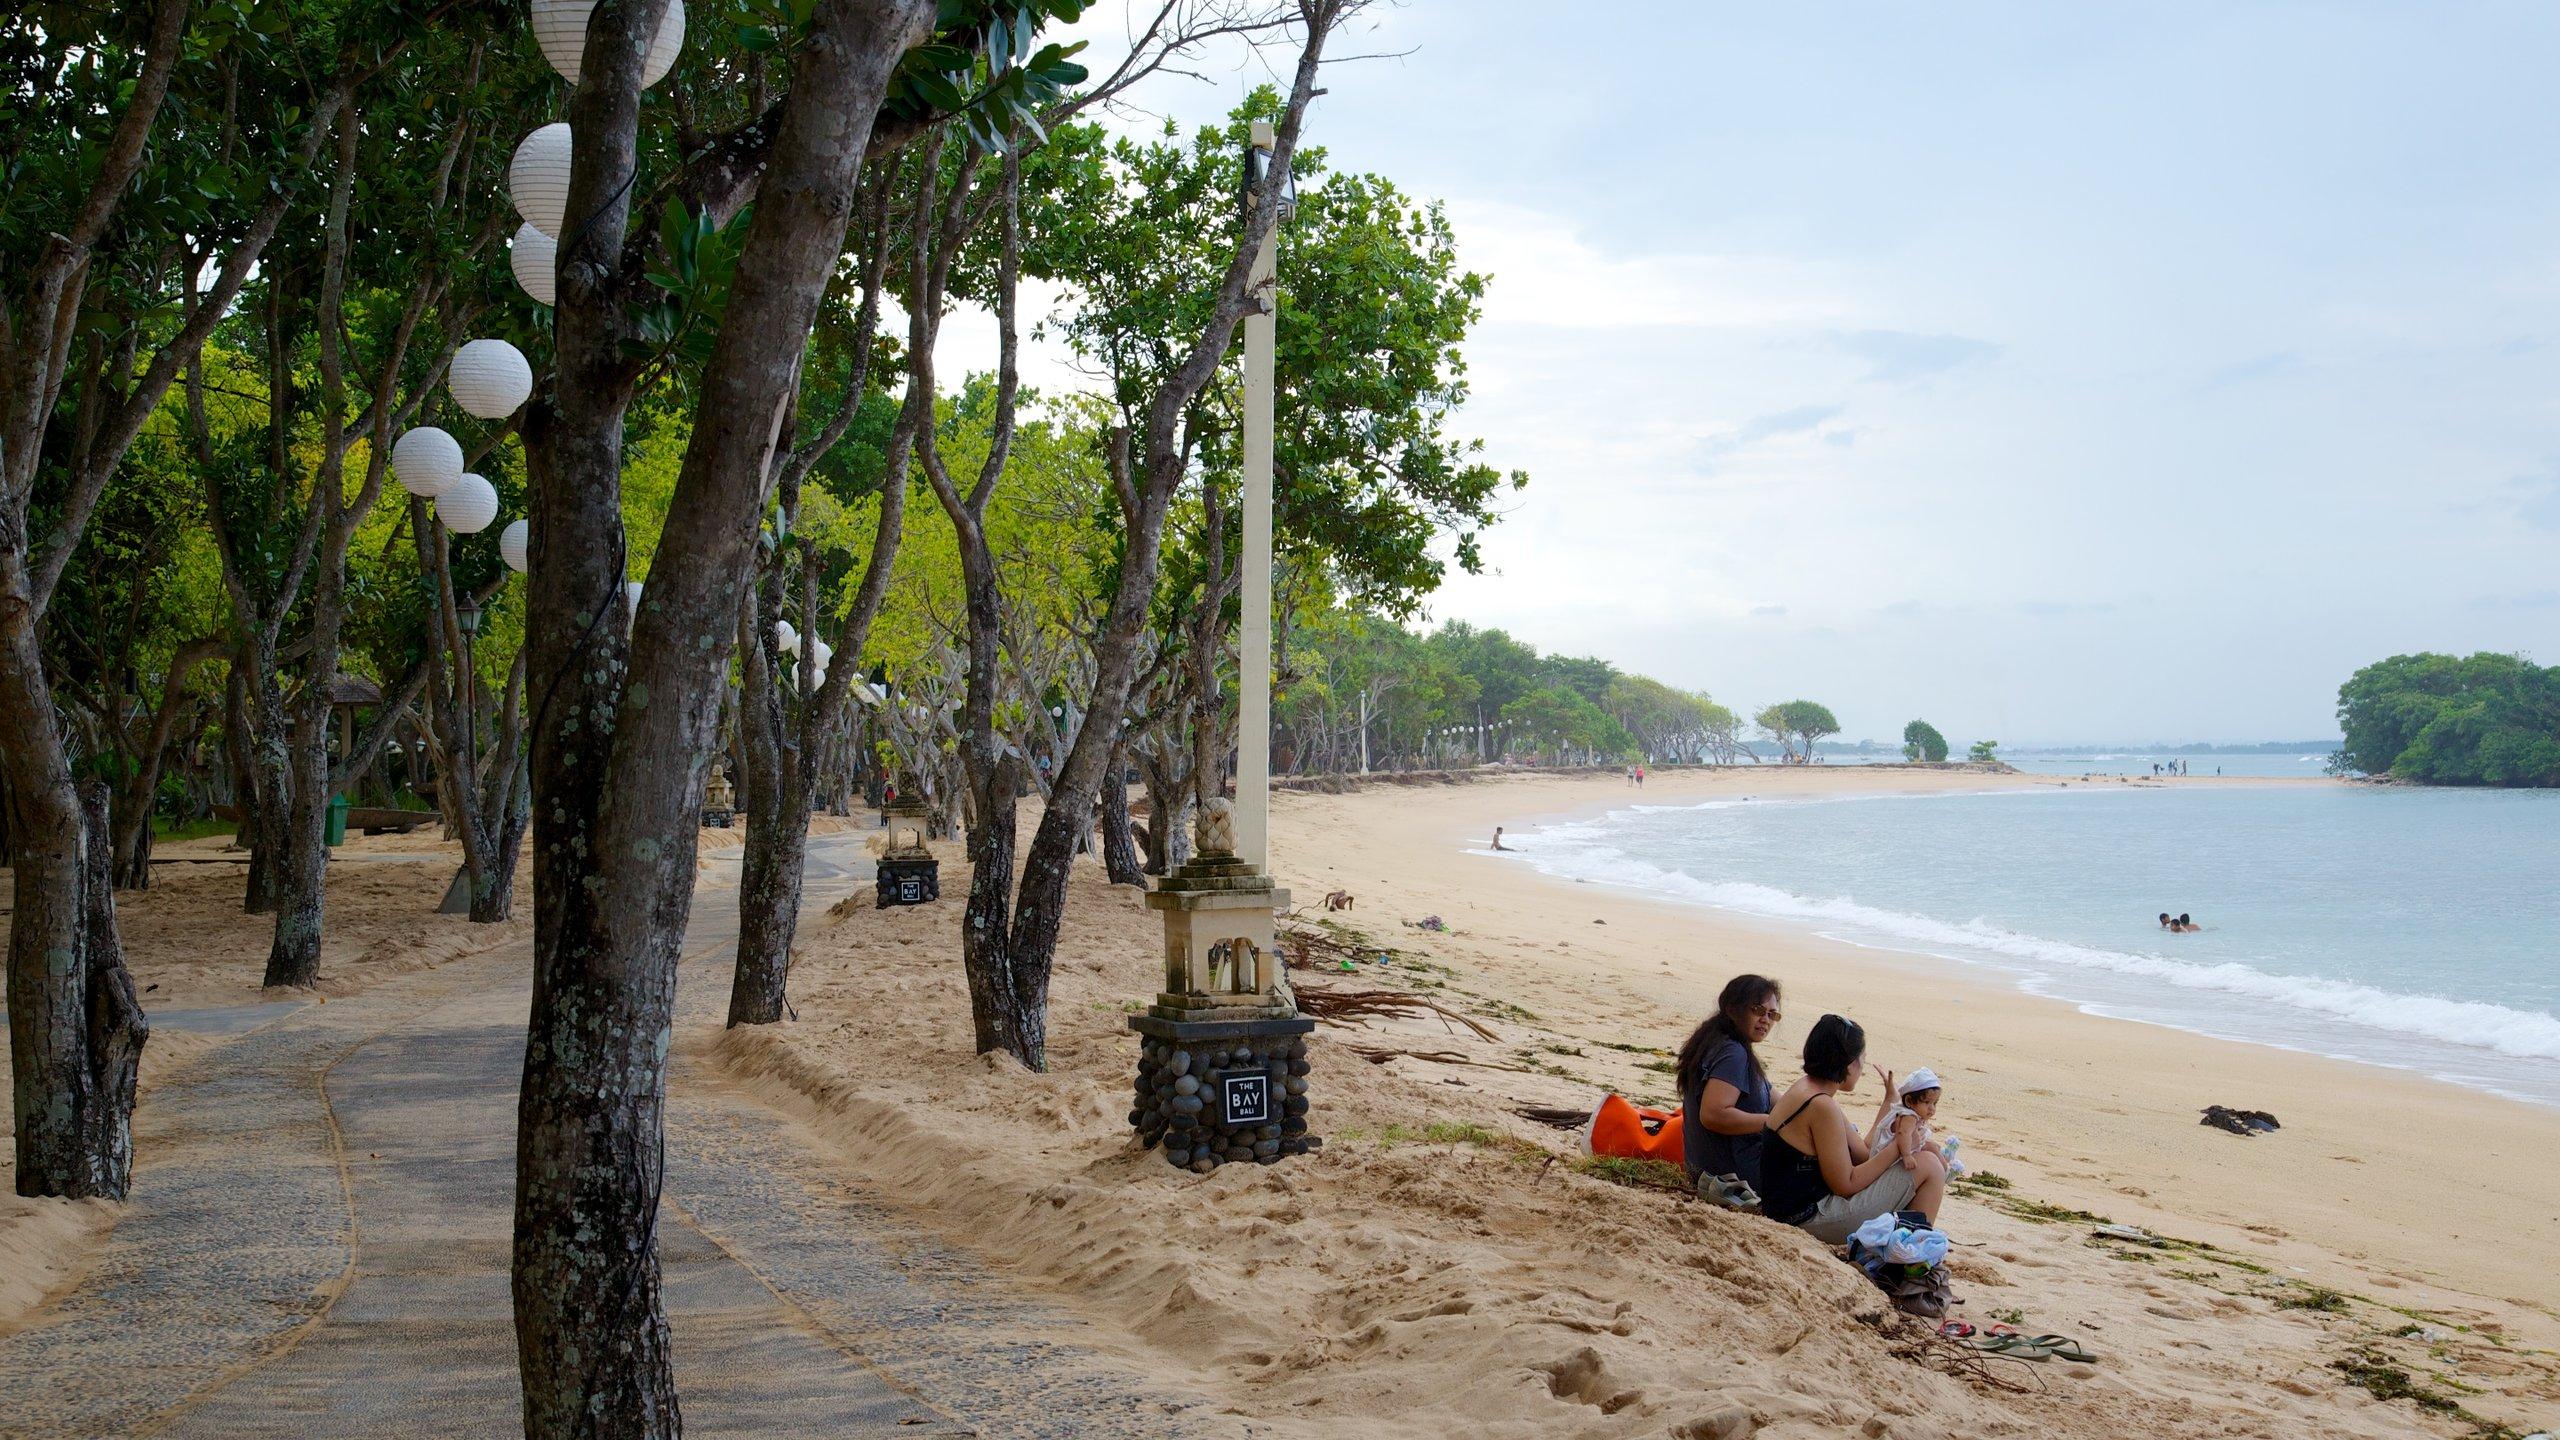 Kuta Selatan, Bali, Indonesia